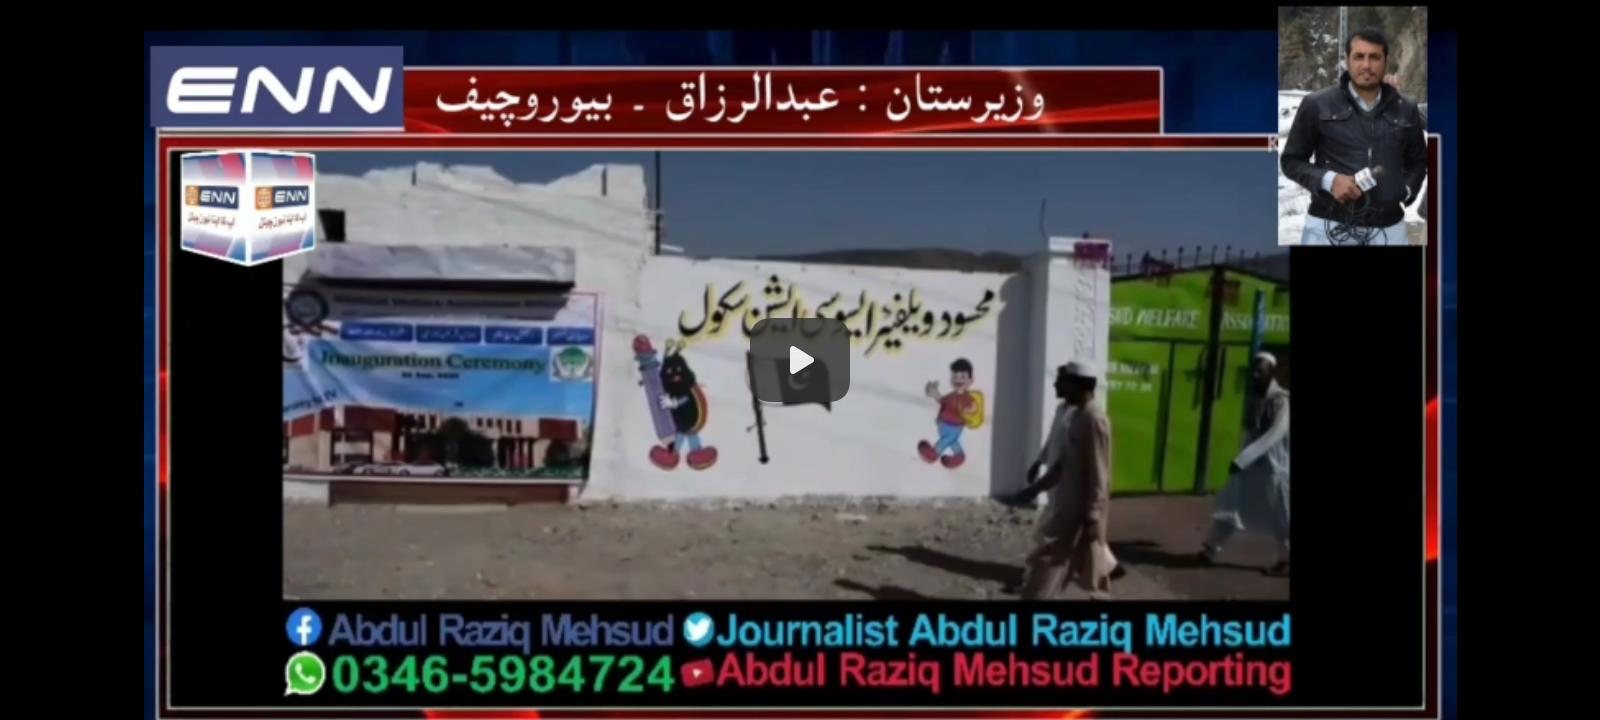 ساؤتھ وزیرستان : عبدالرزاق – بیوروچیف کی نیوز رپورٹ